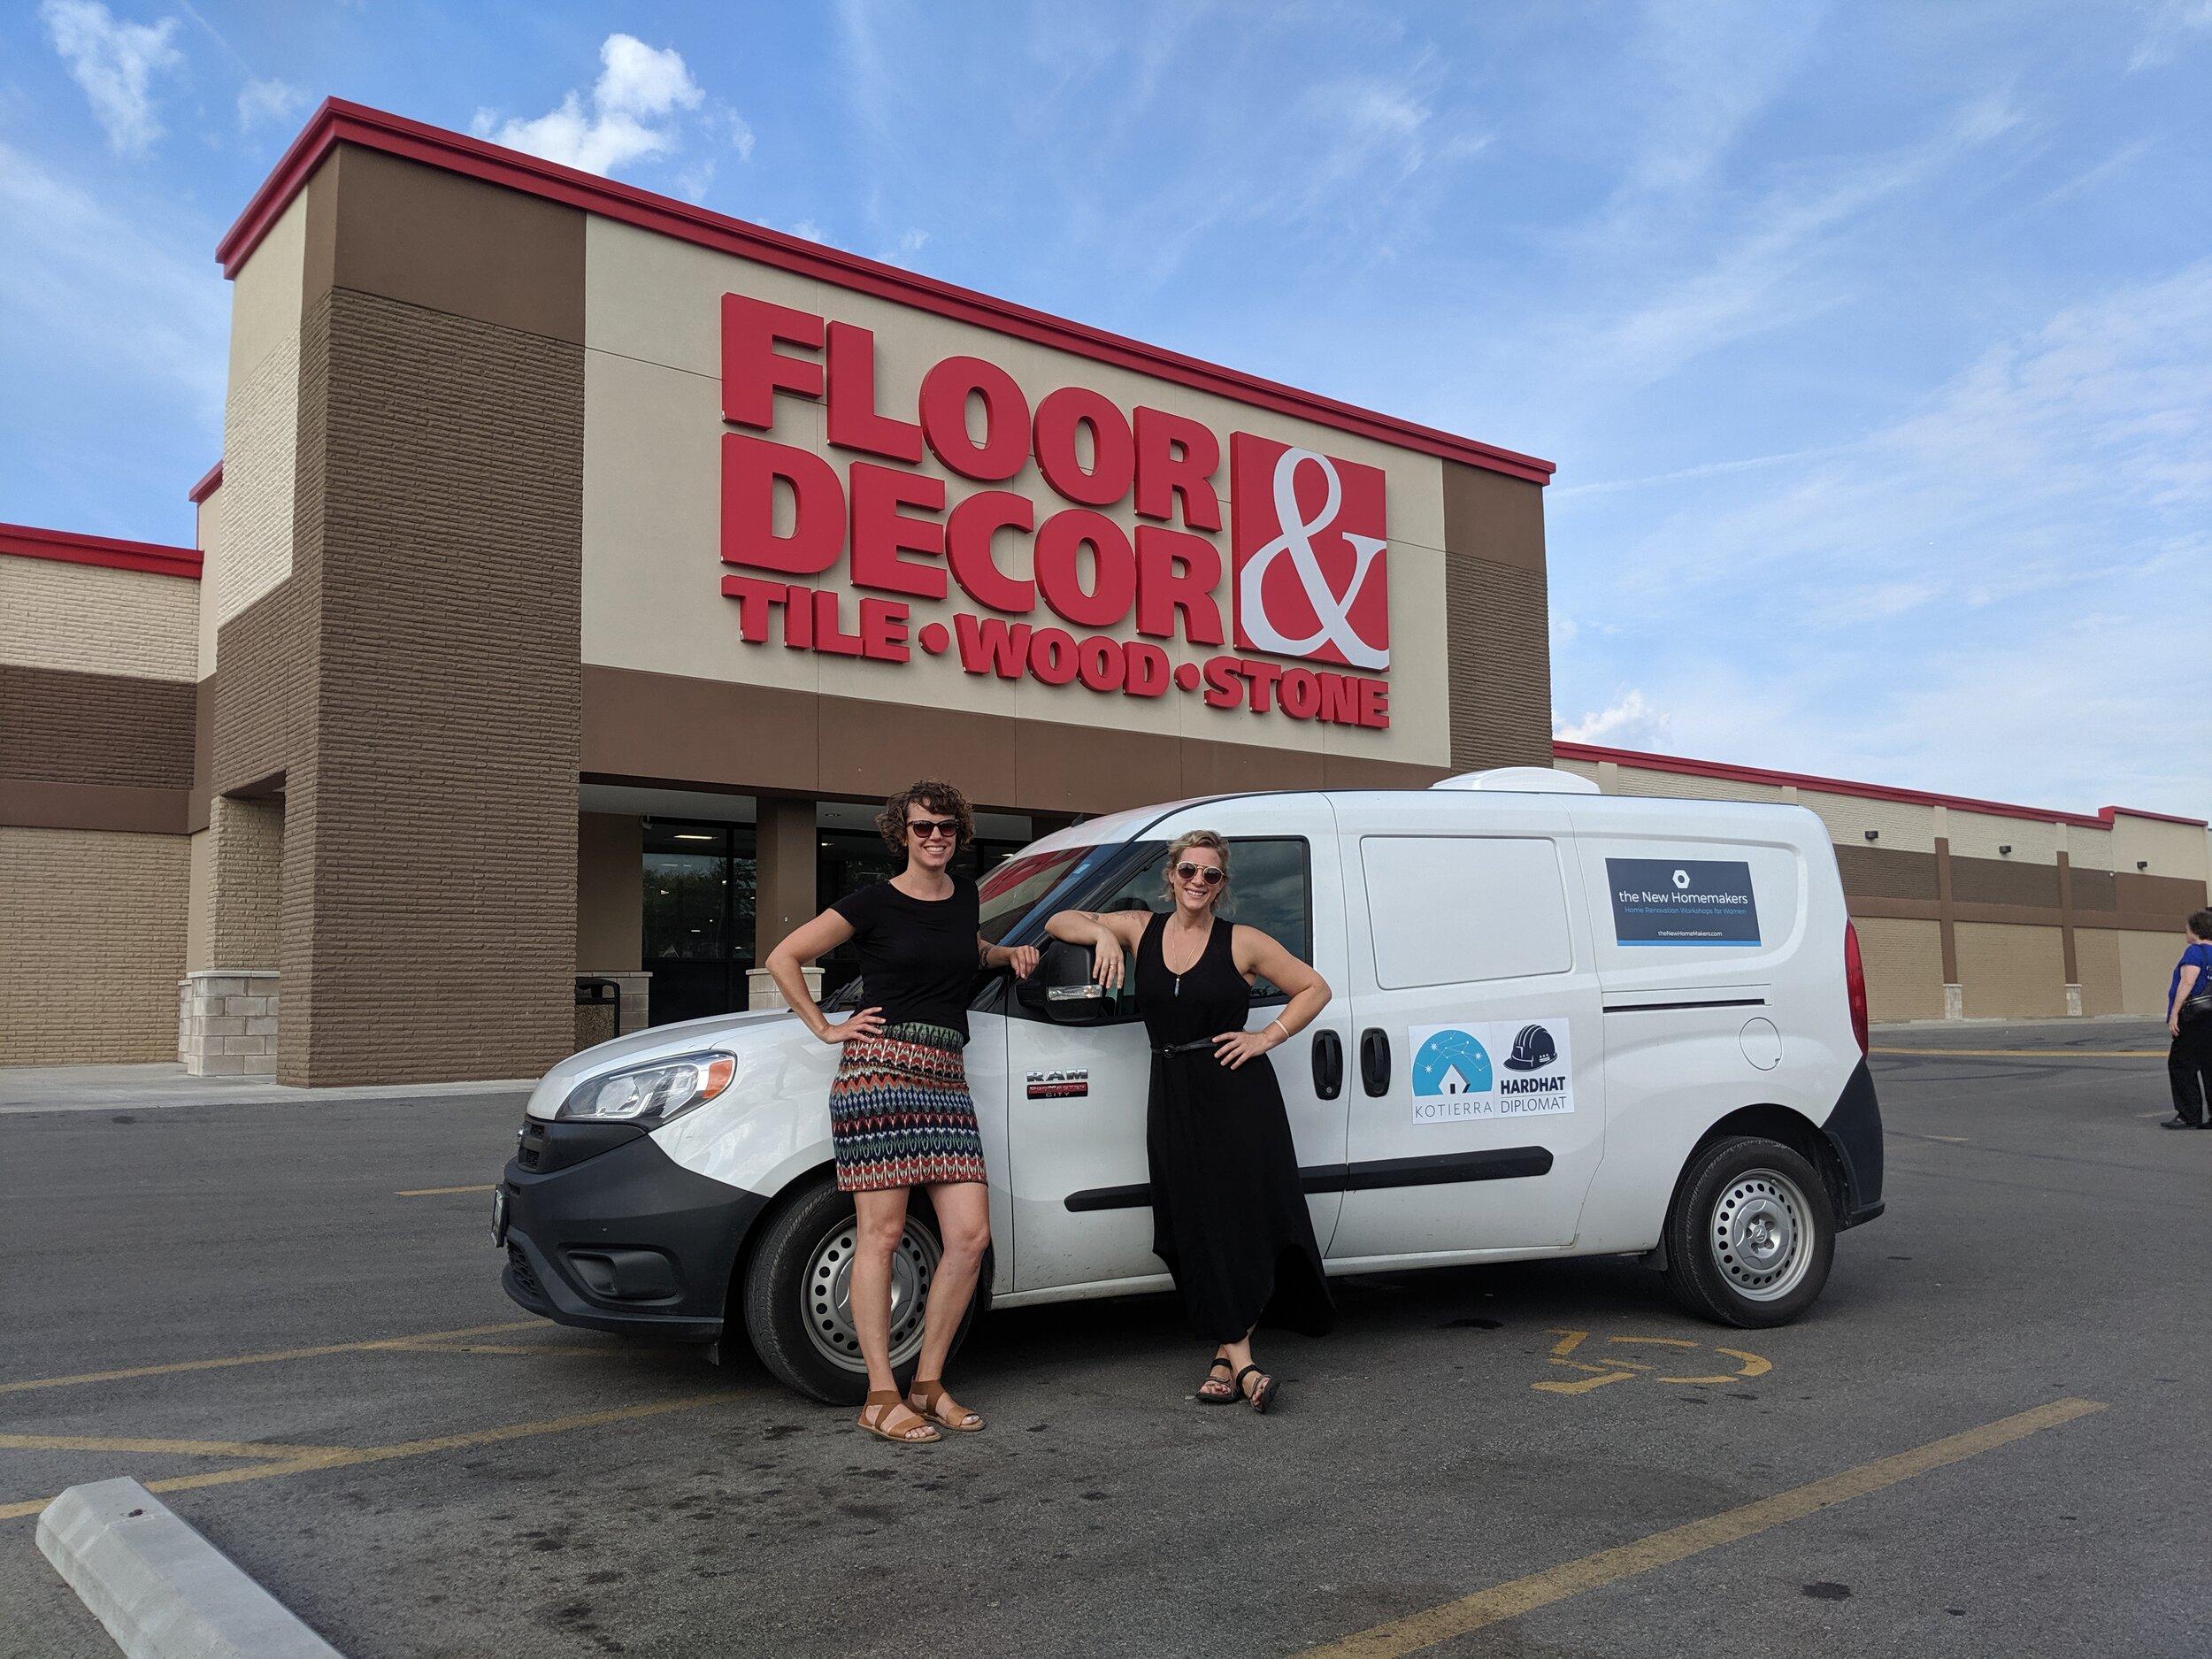 Our National Sponsor - Floor & Decor